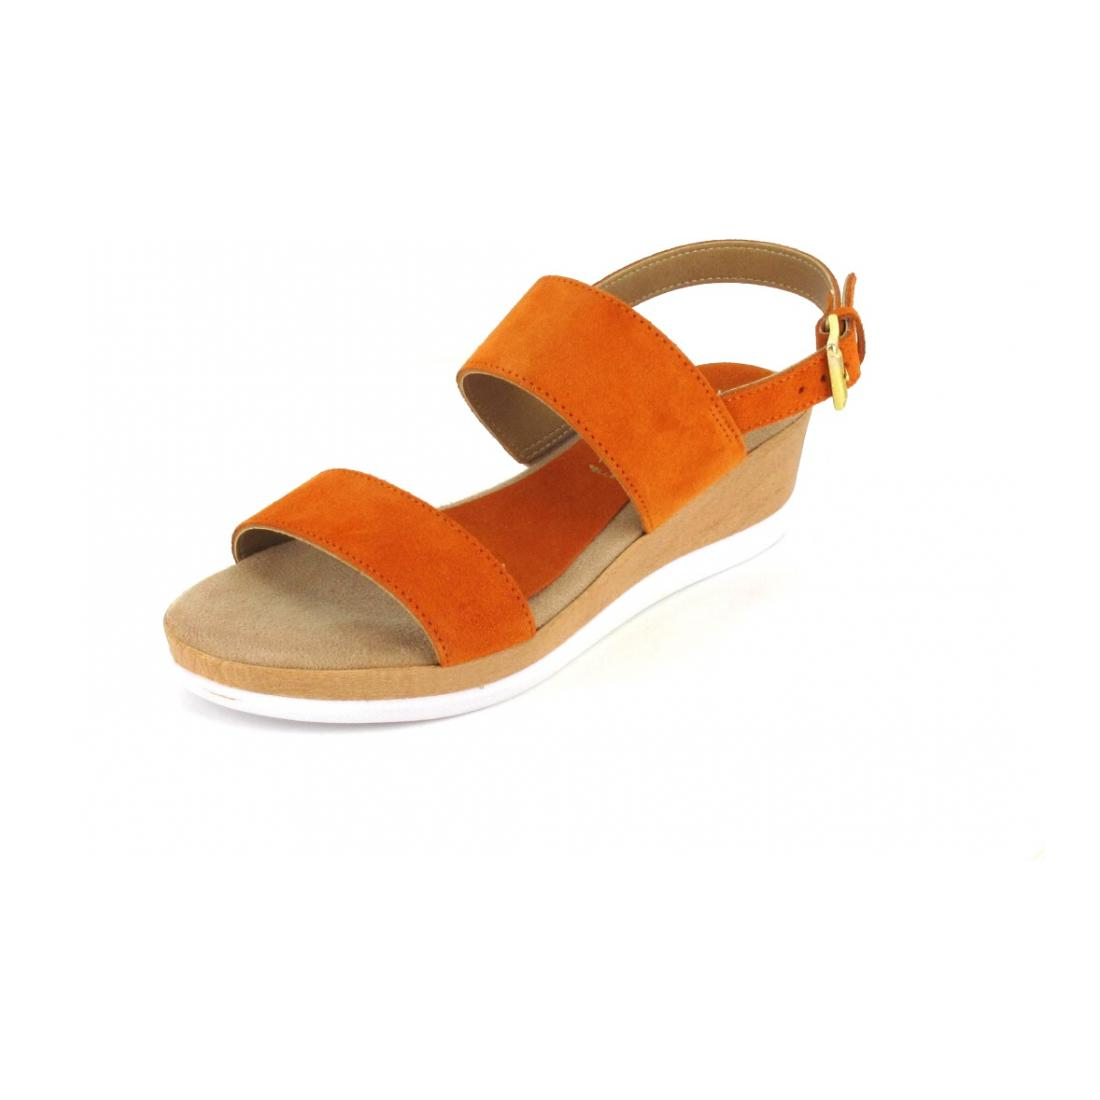 Sandy Shoes Sandale Arancio 400